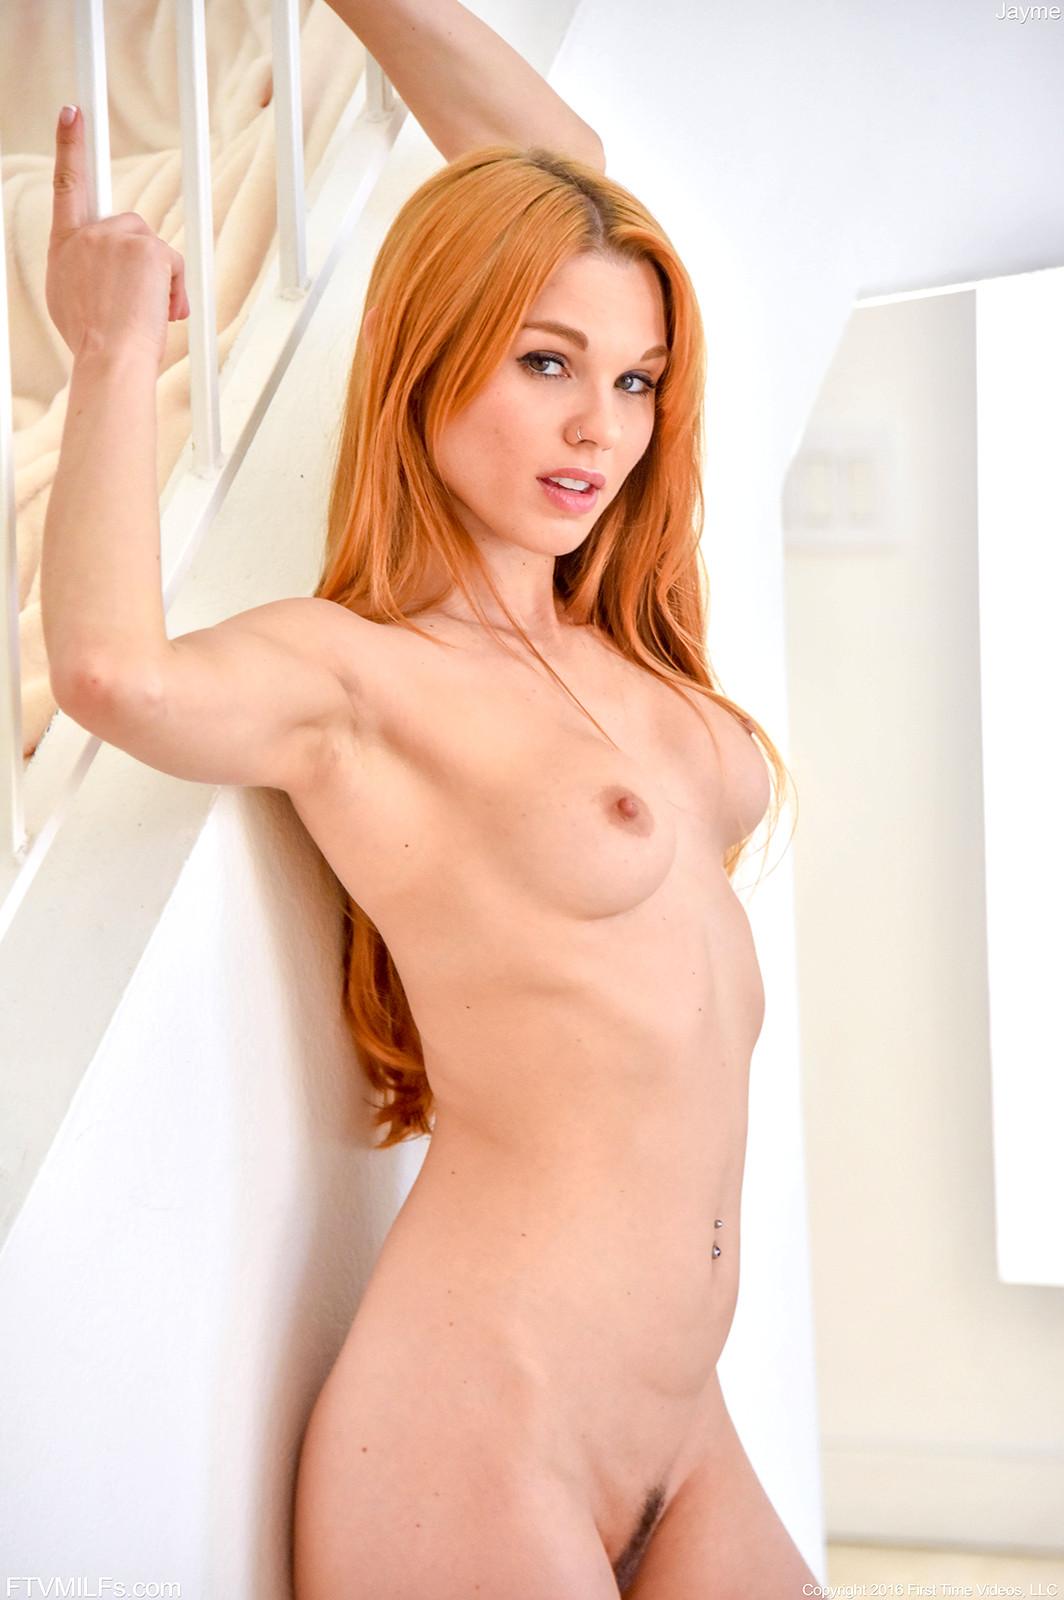 Jayme Langford Pornstar